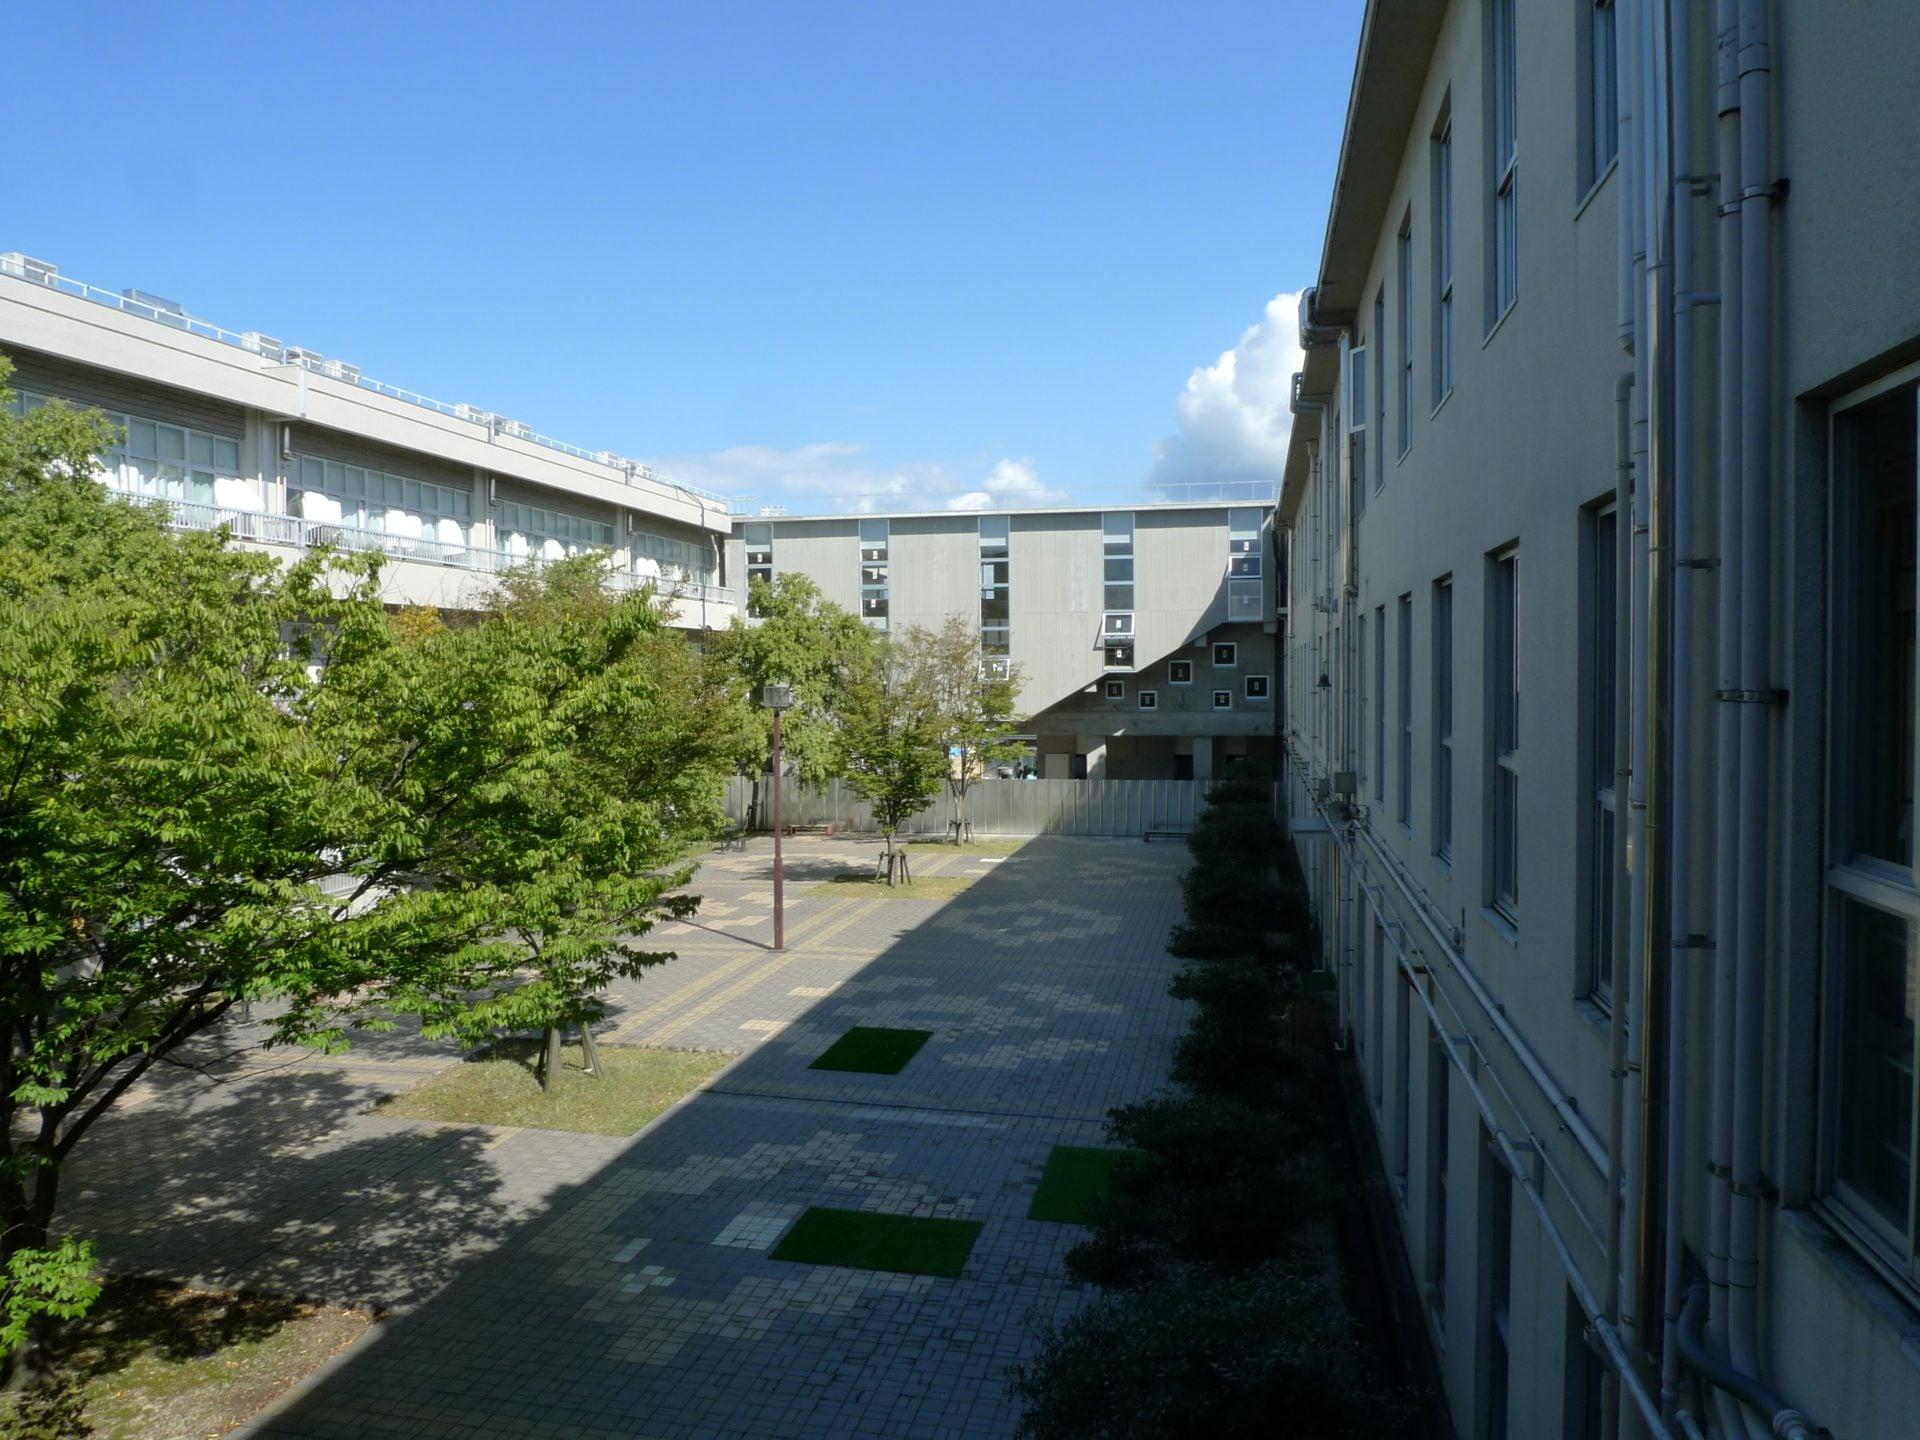 八代高校 東側渡り廊下